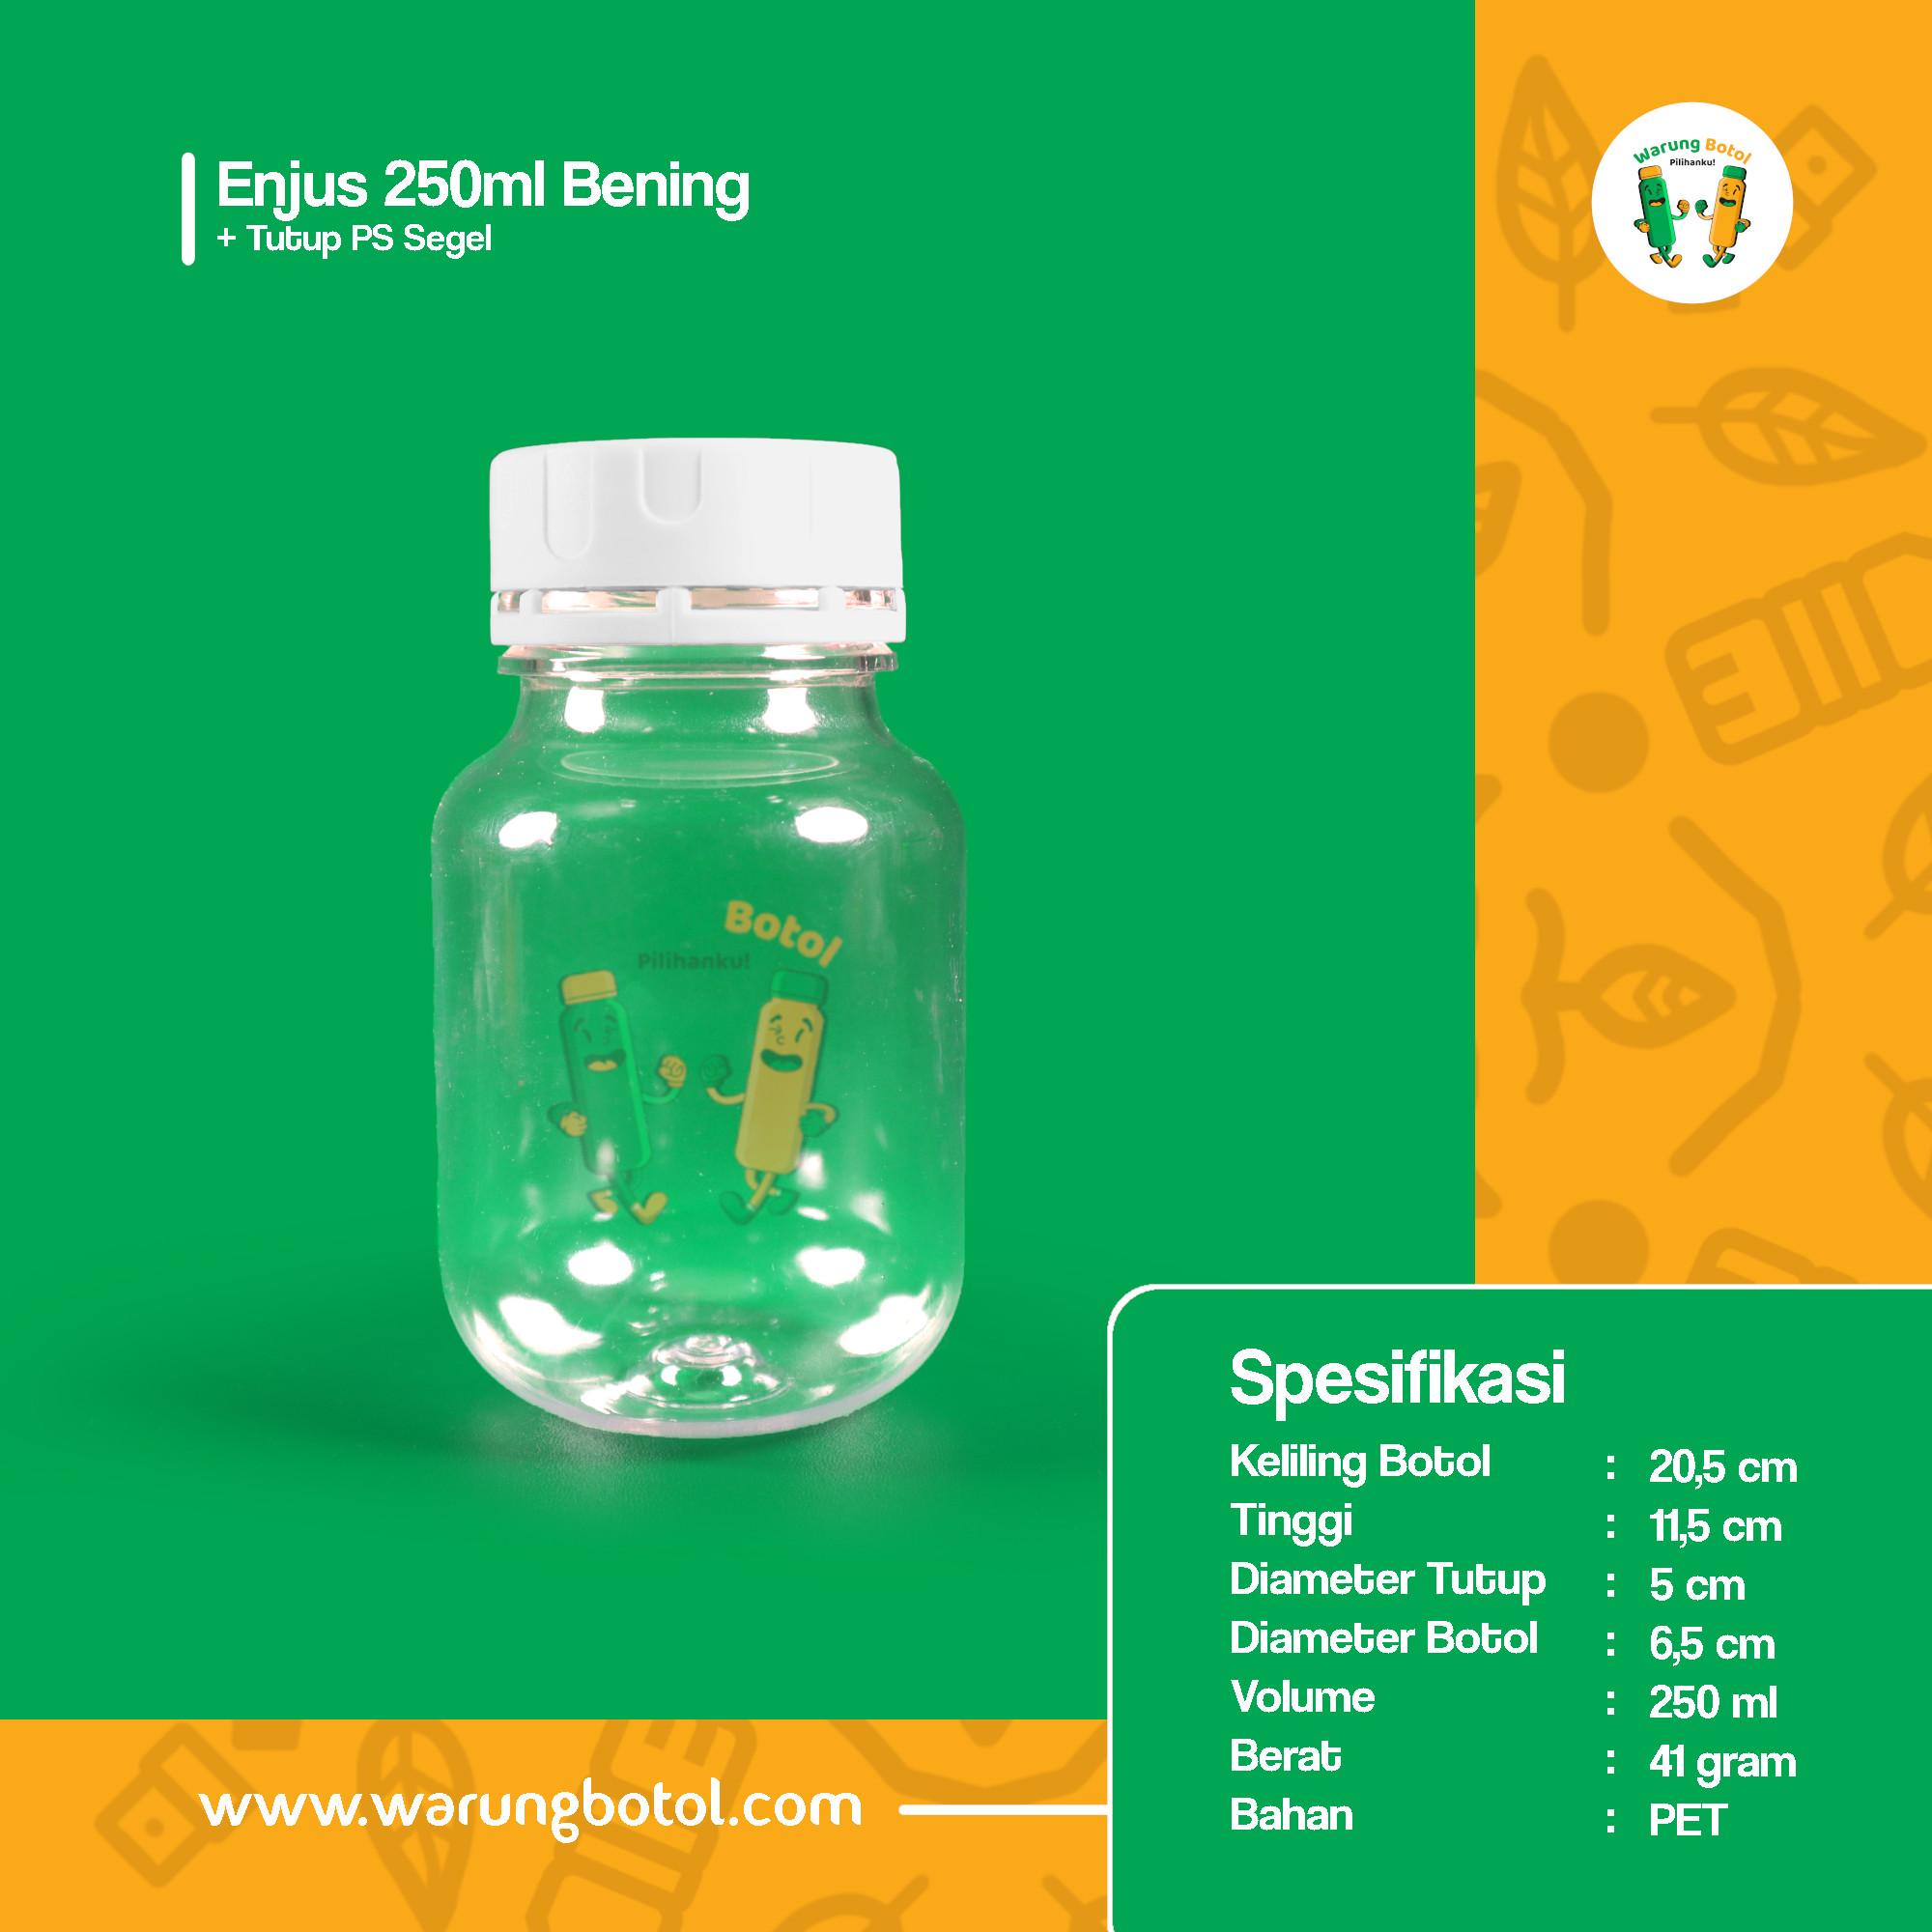 distributor jual botol plastik minuman unik 250ml bening murah terdekat bandung jakarta bogor bekasi